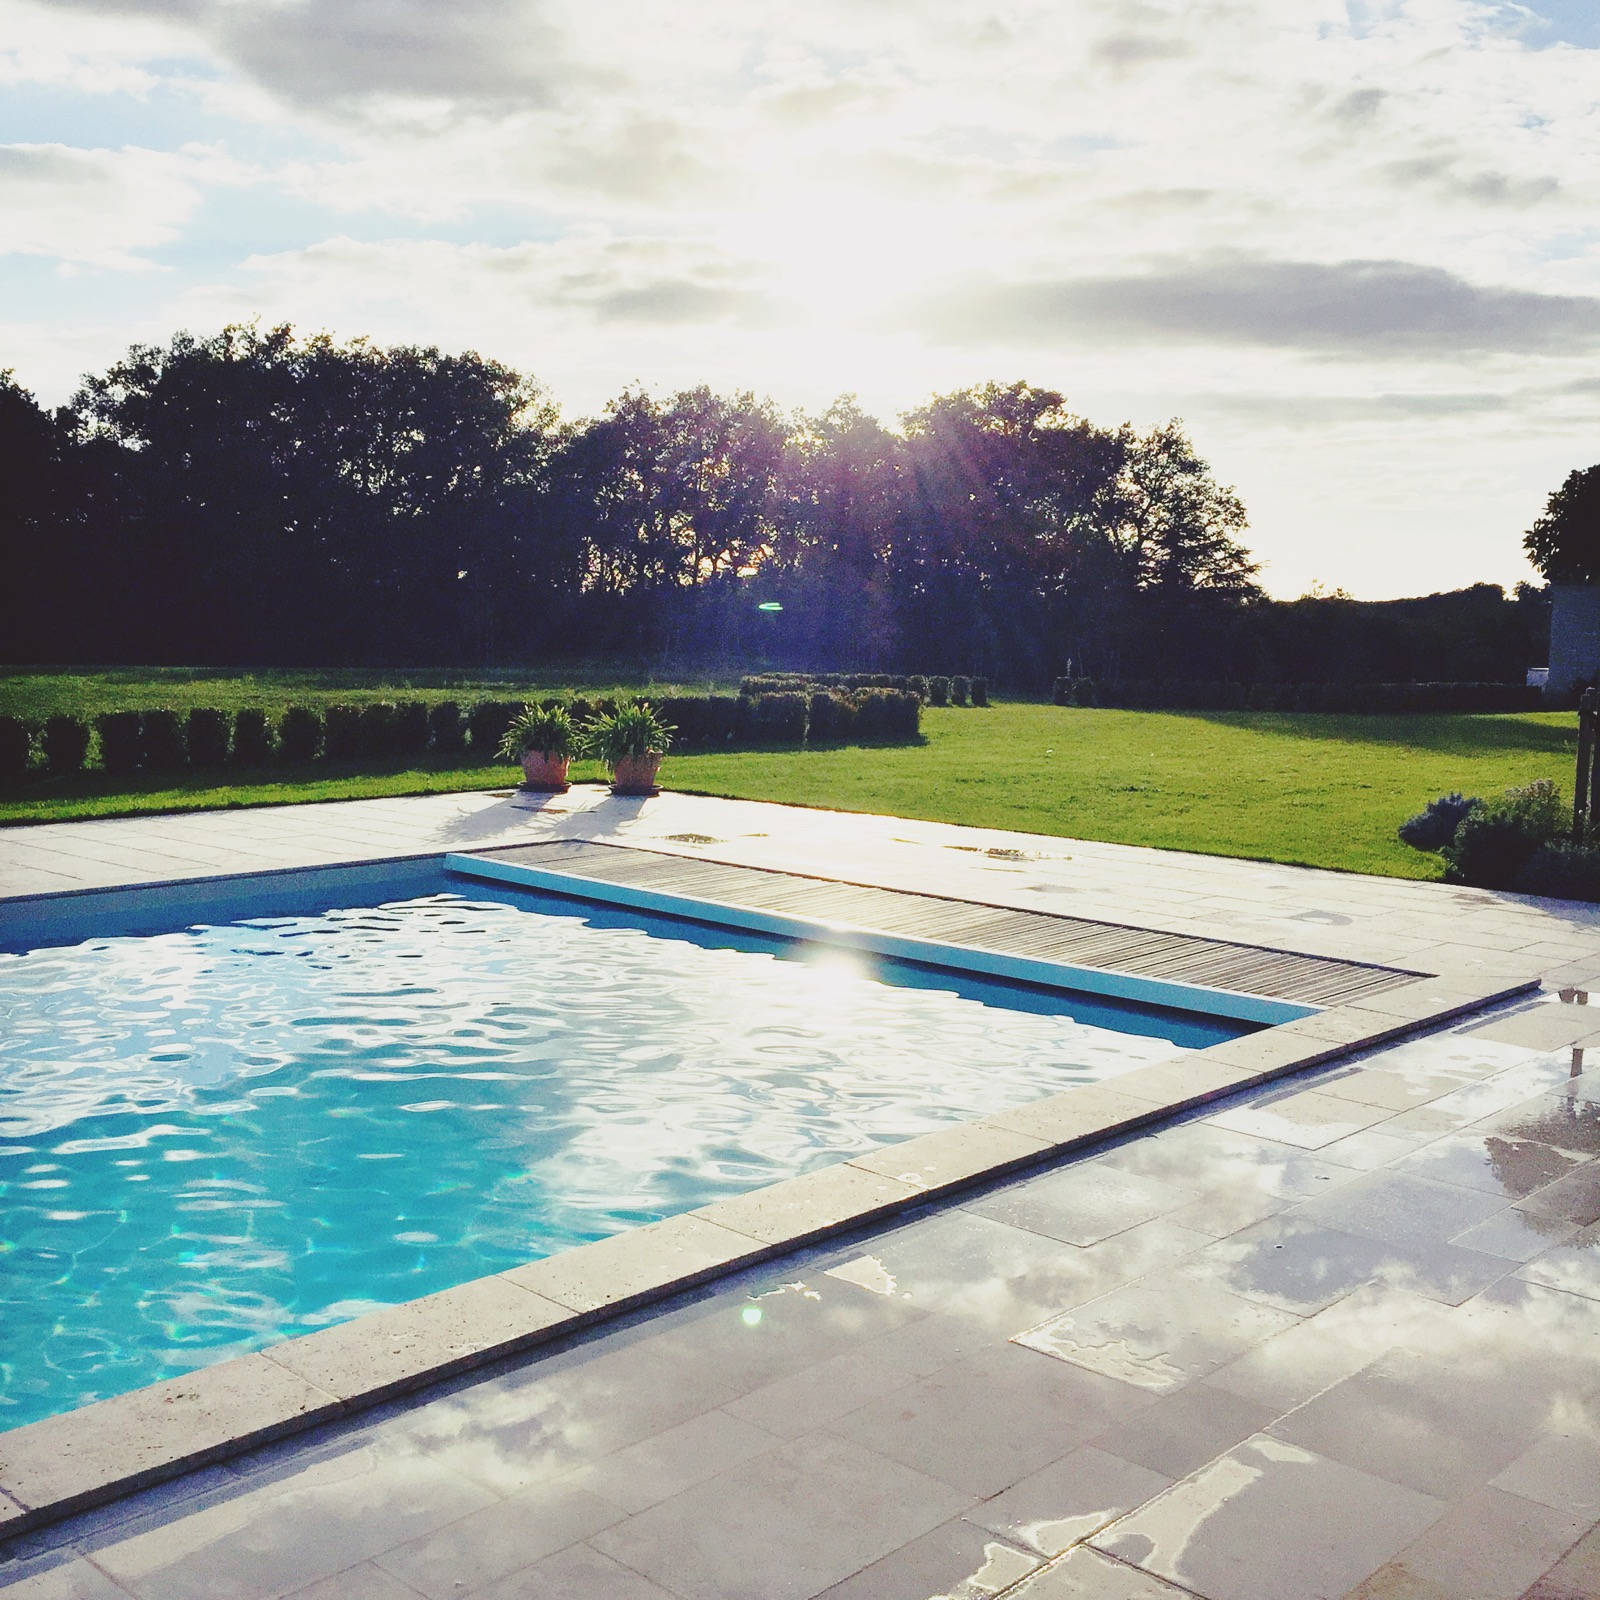 The pool at La Bailie, Salles.